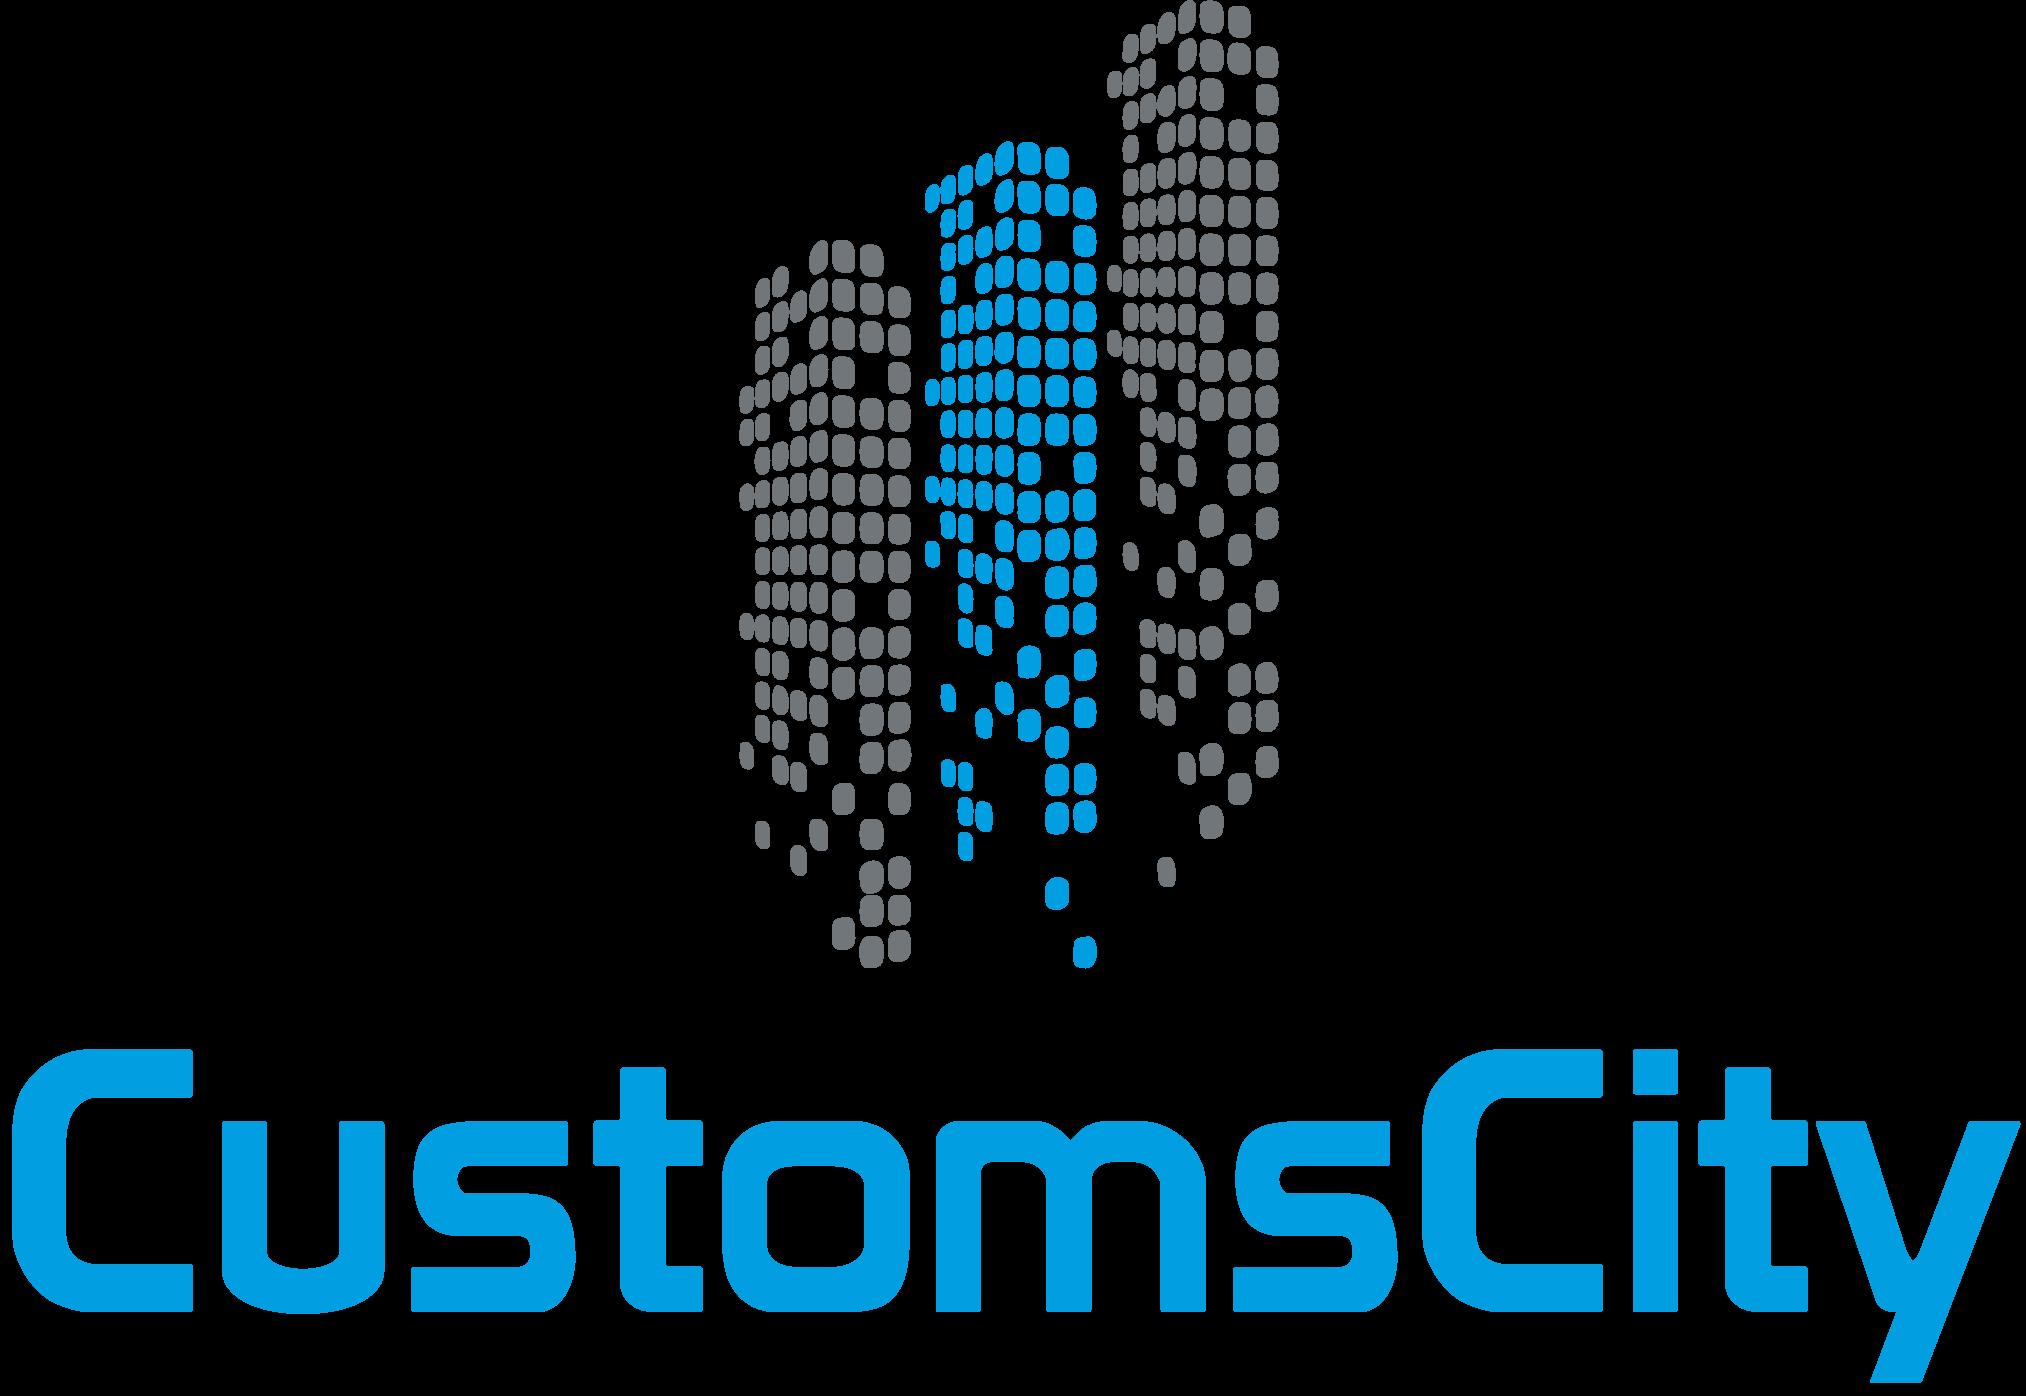 Customs City Global Solutions Inc.